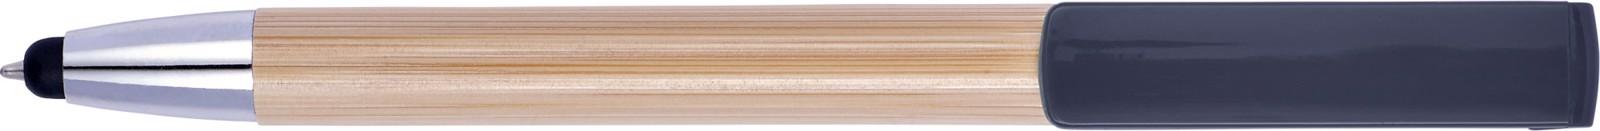 Bolígrafo de bambú y puntero táctil - Black